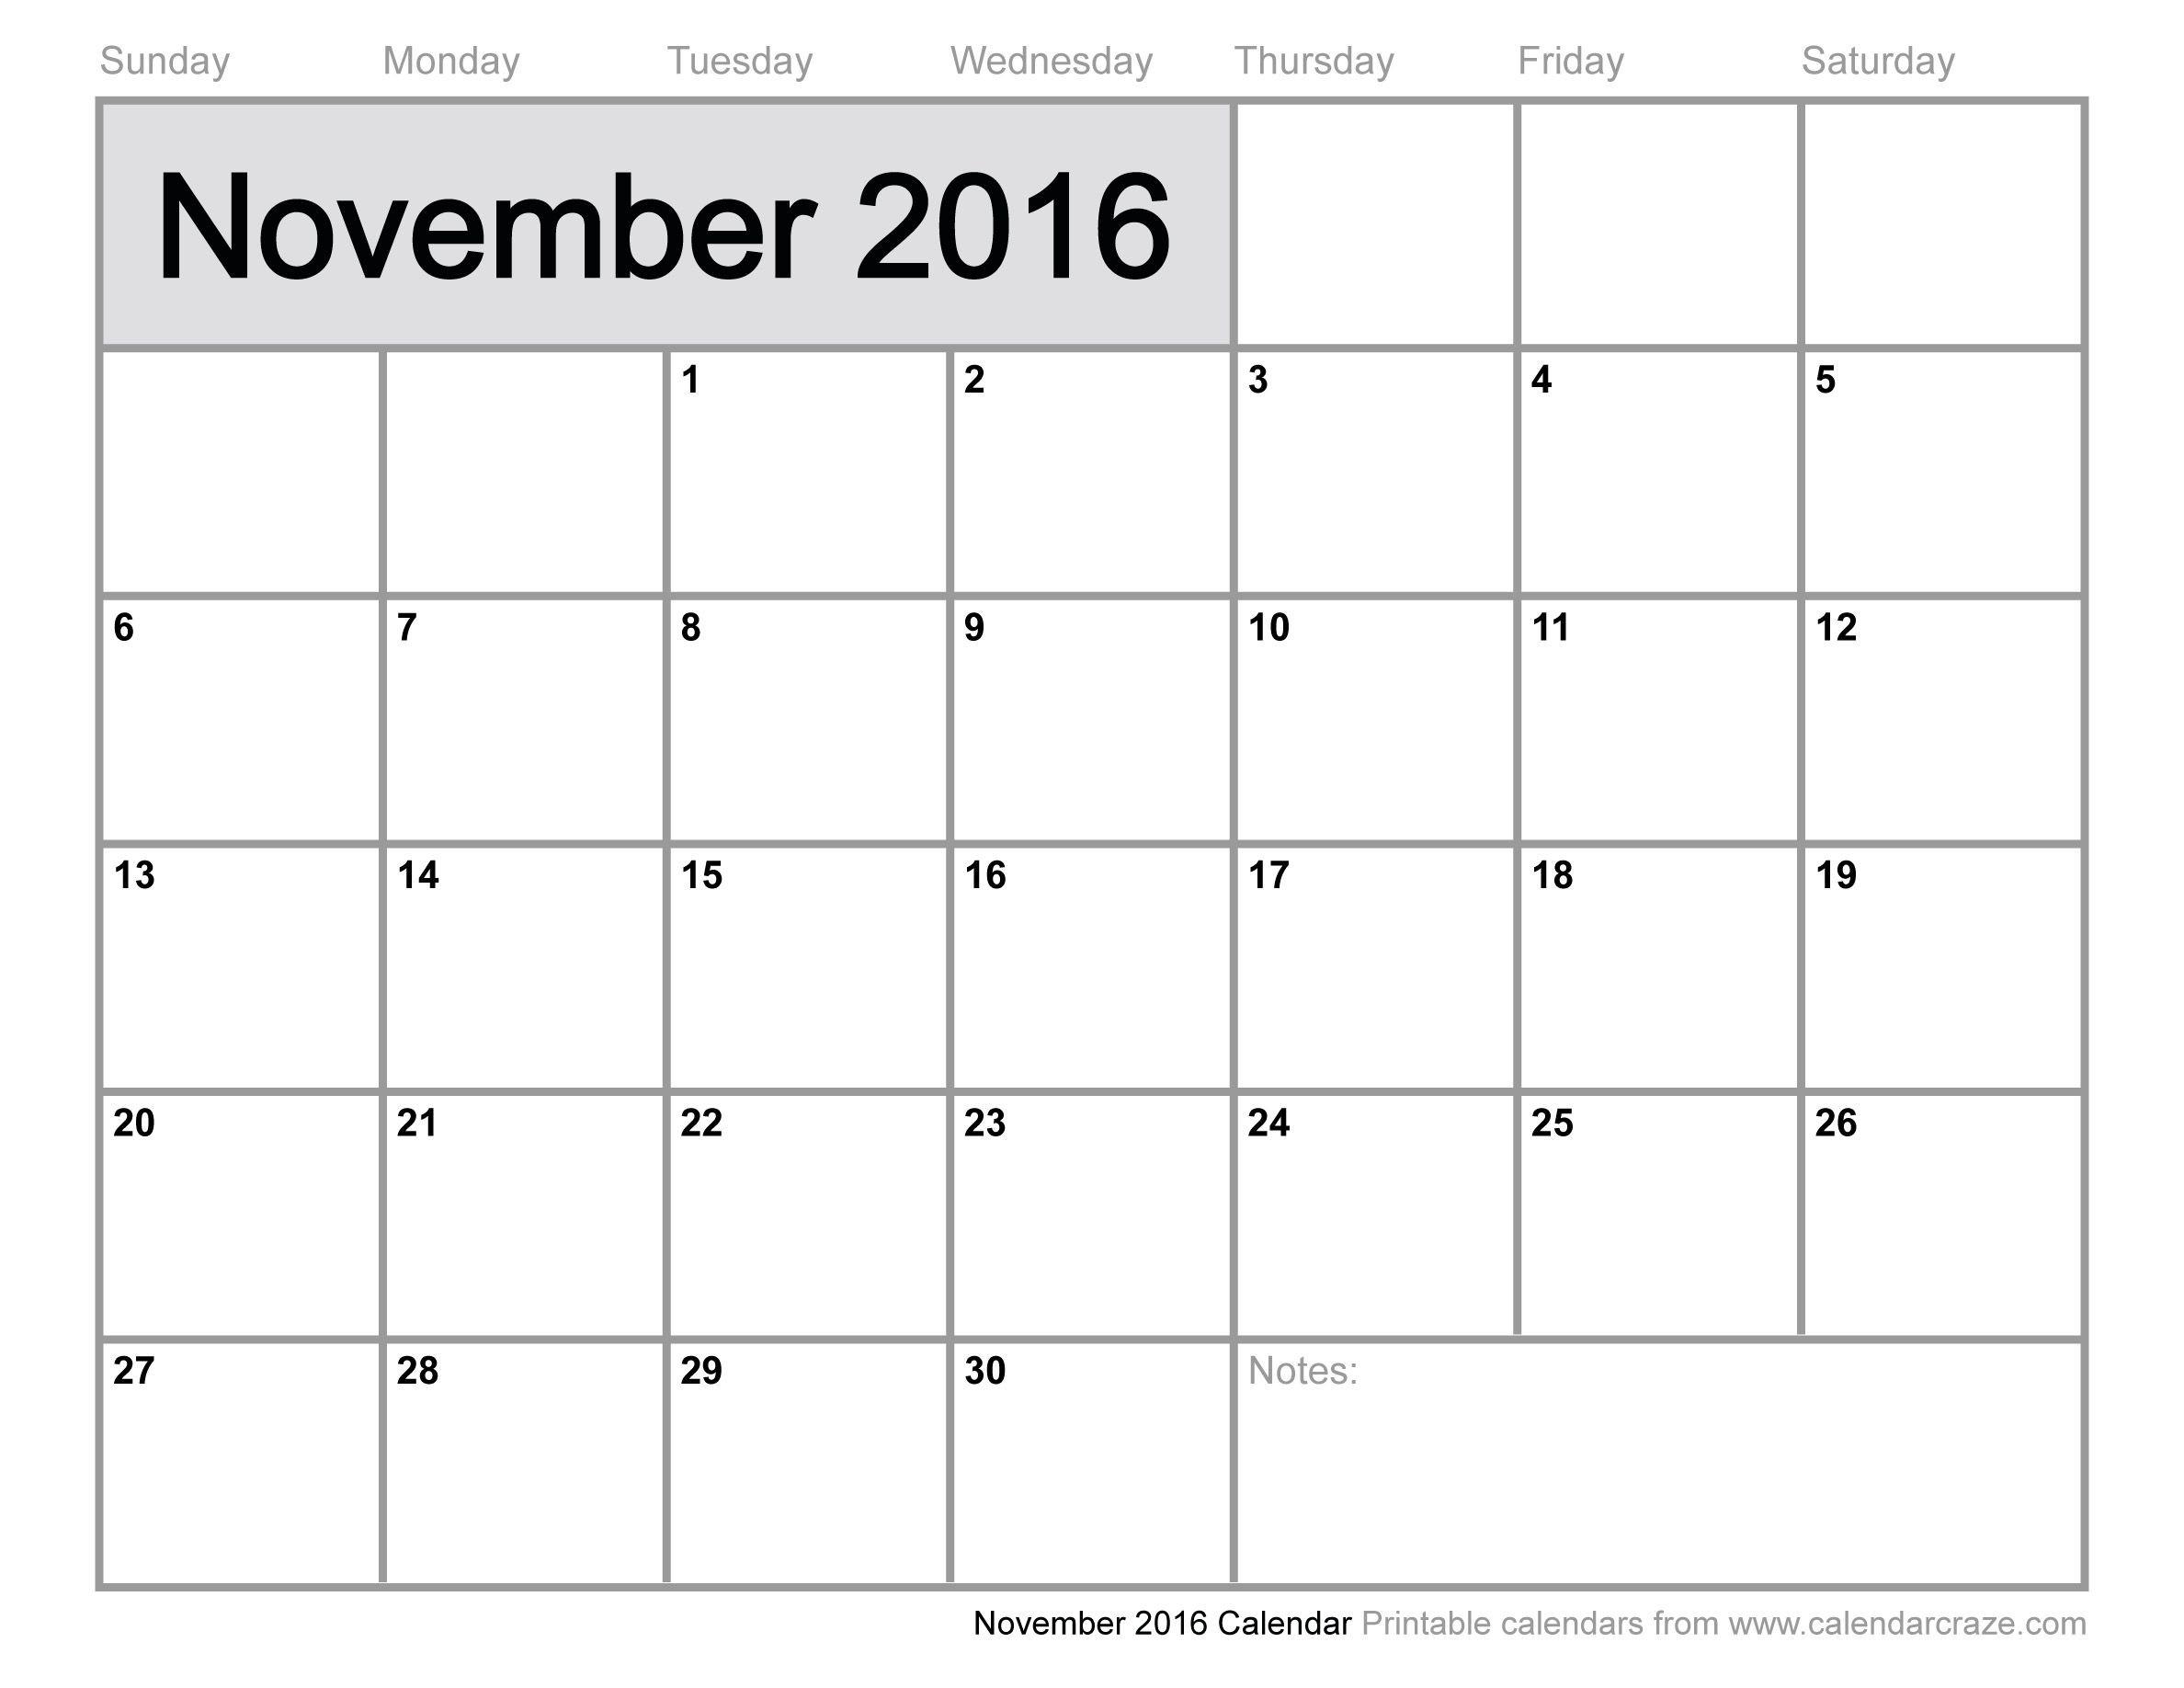 November 2016 Calendar Panchang - Template - Template | Calender  2014 Calendar Printable Full Page